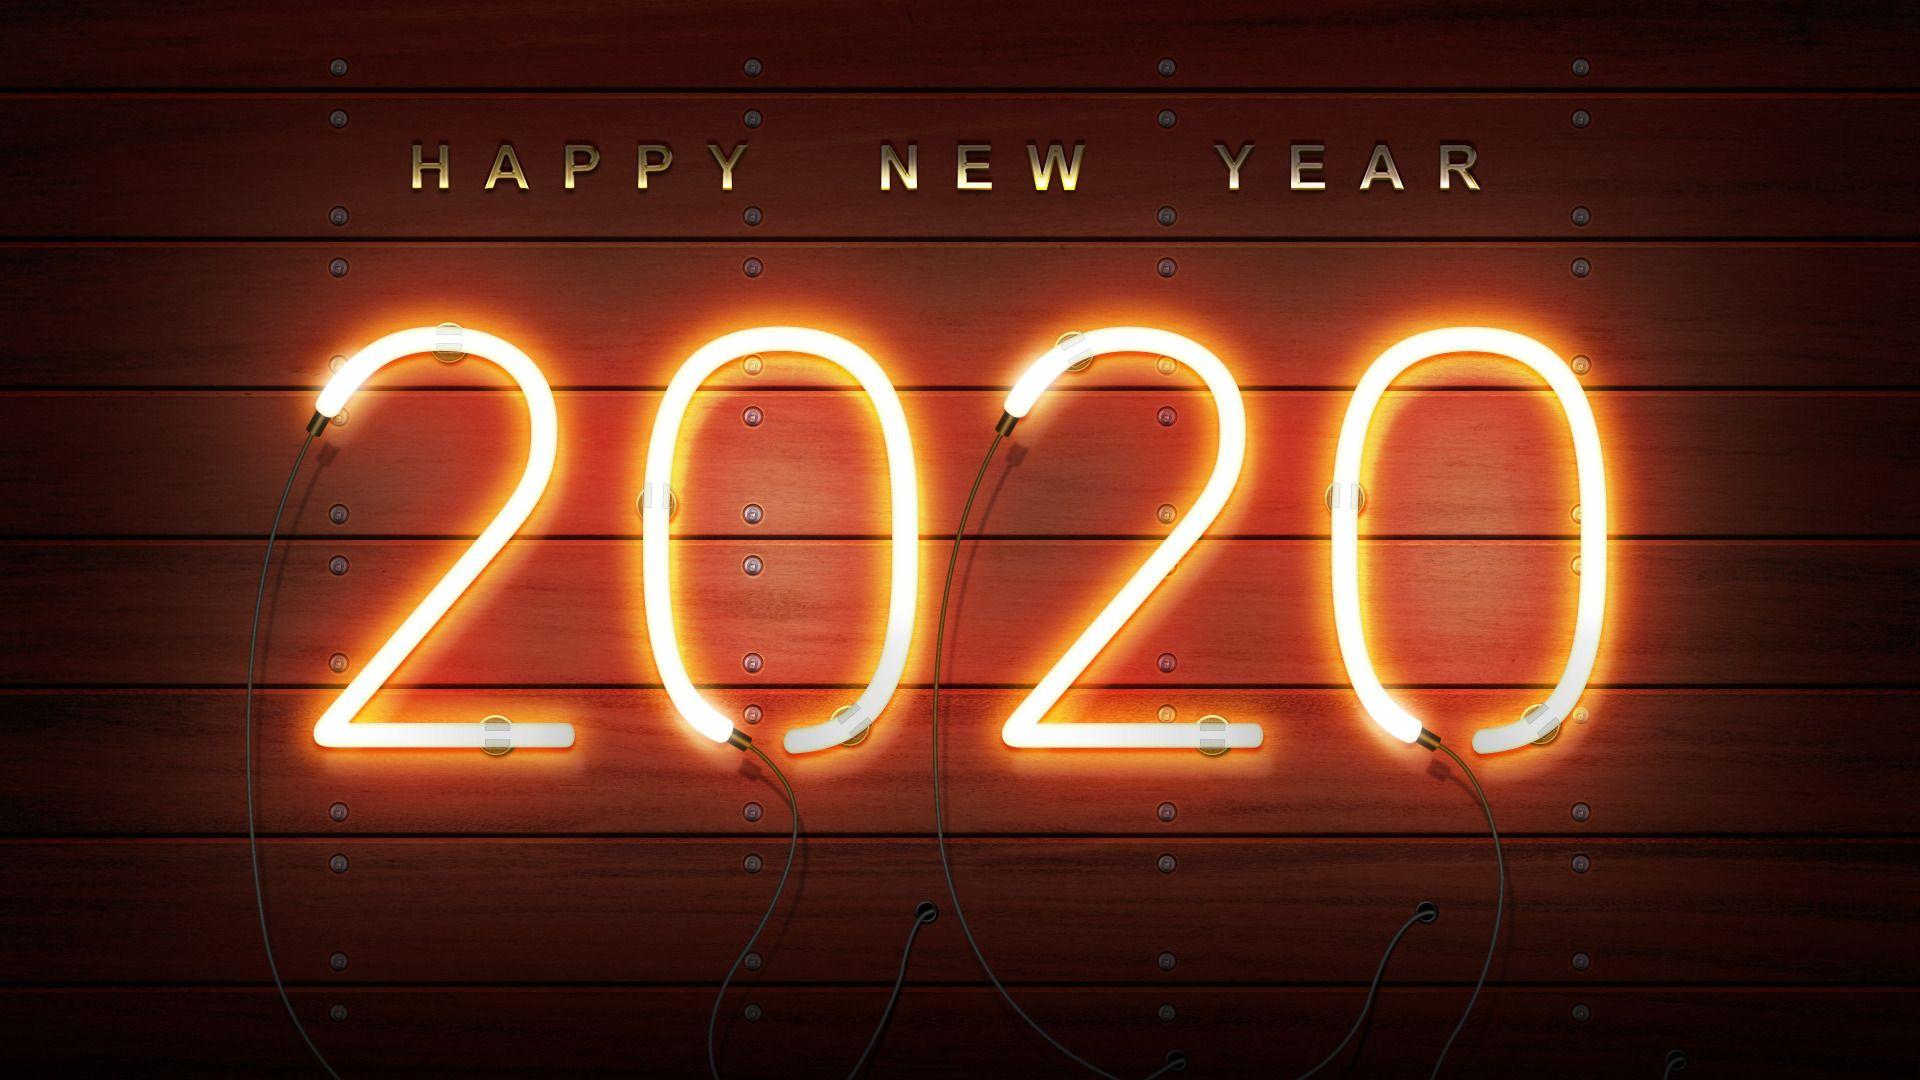 2020 New Year screen wallpaper